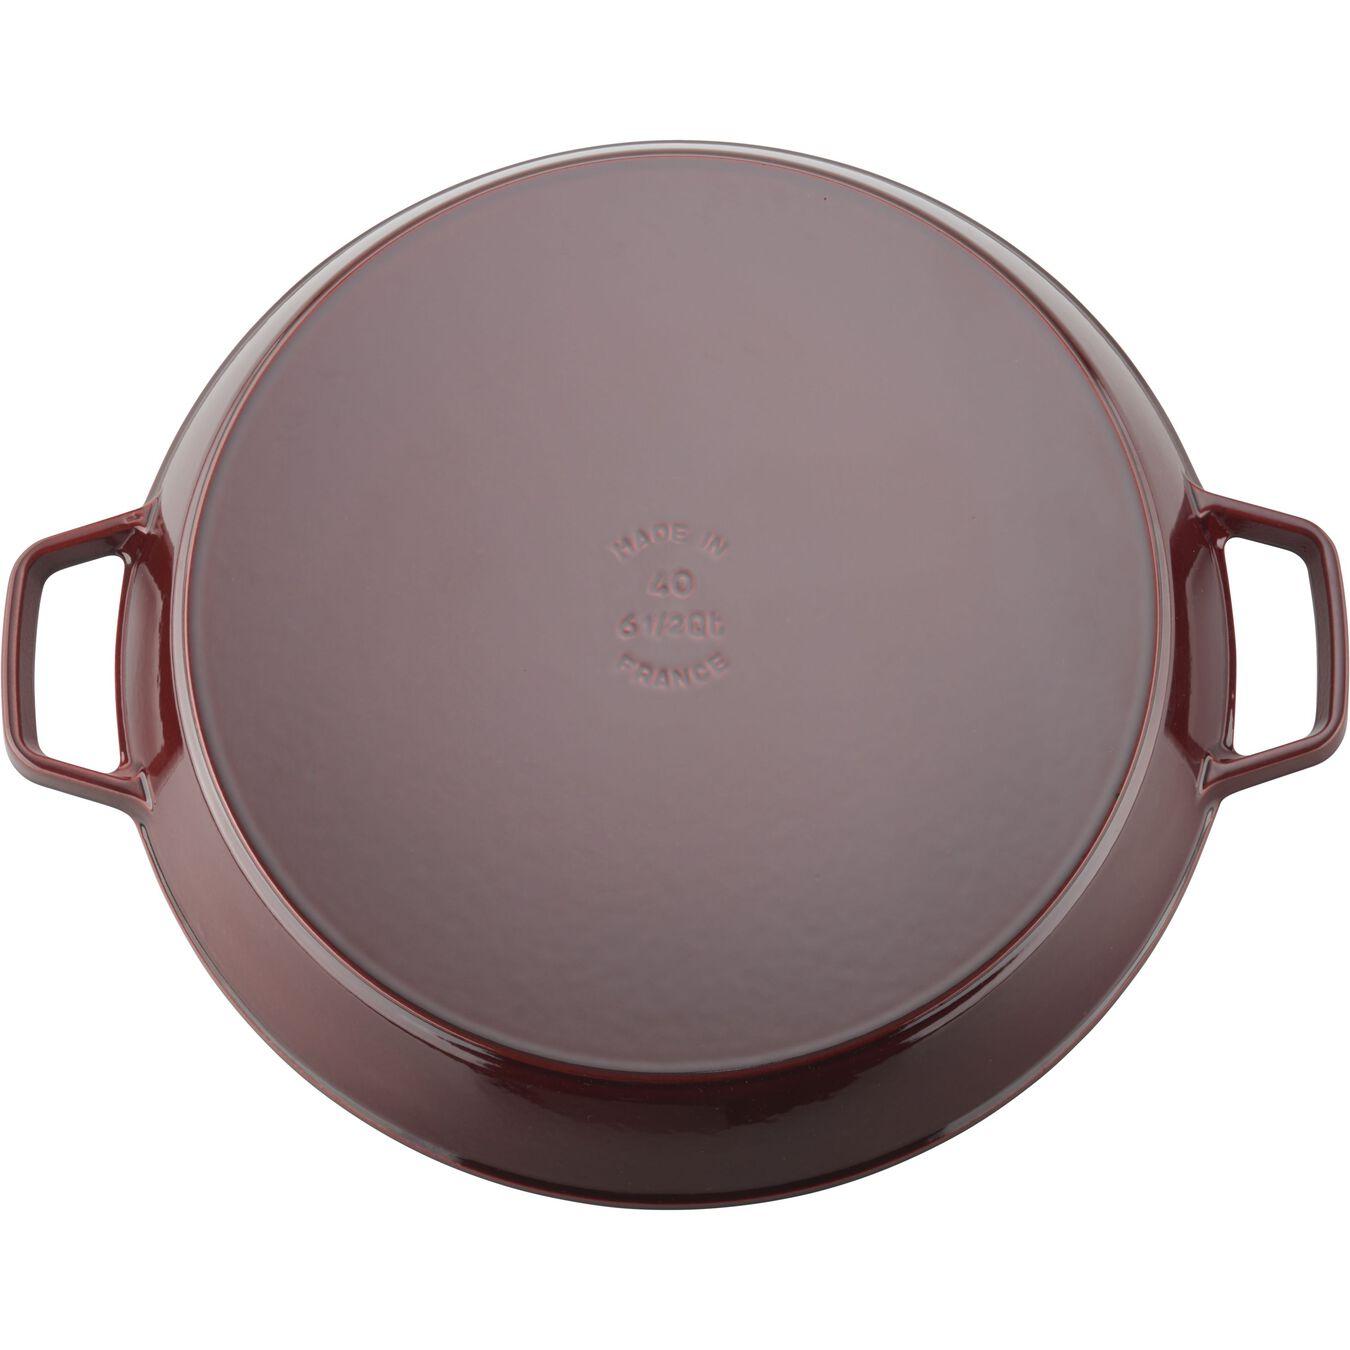 15-inch Double Handle Fry Pan / Paella Pan - Grenadine,,large 3